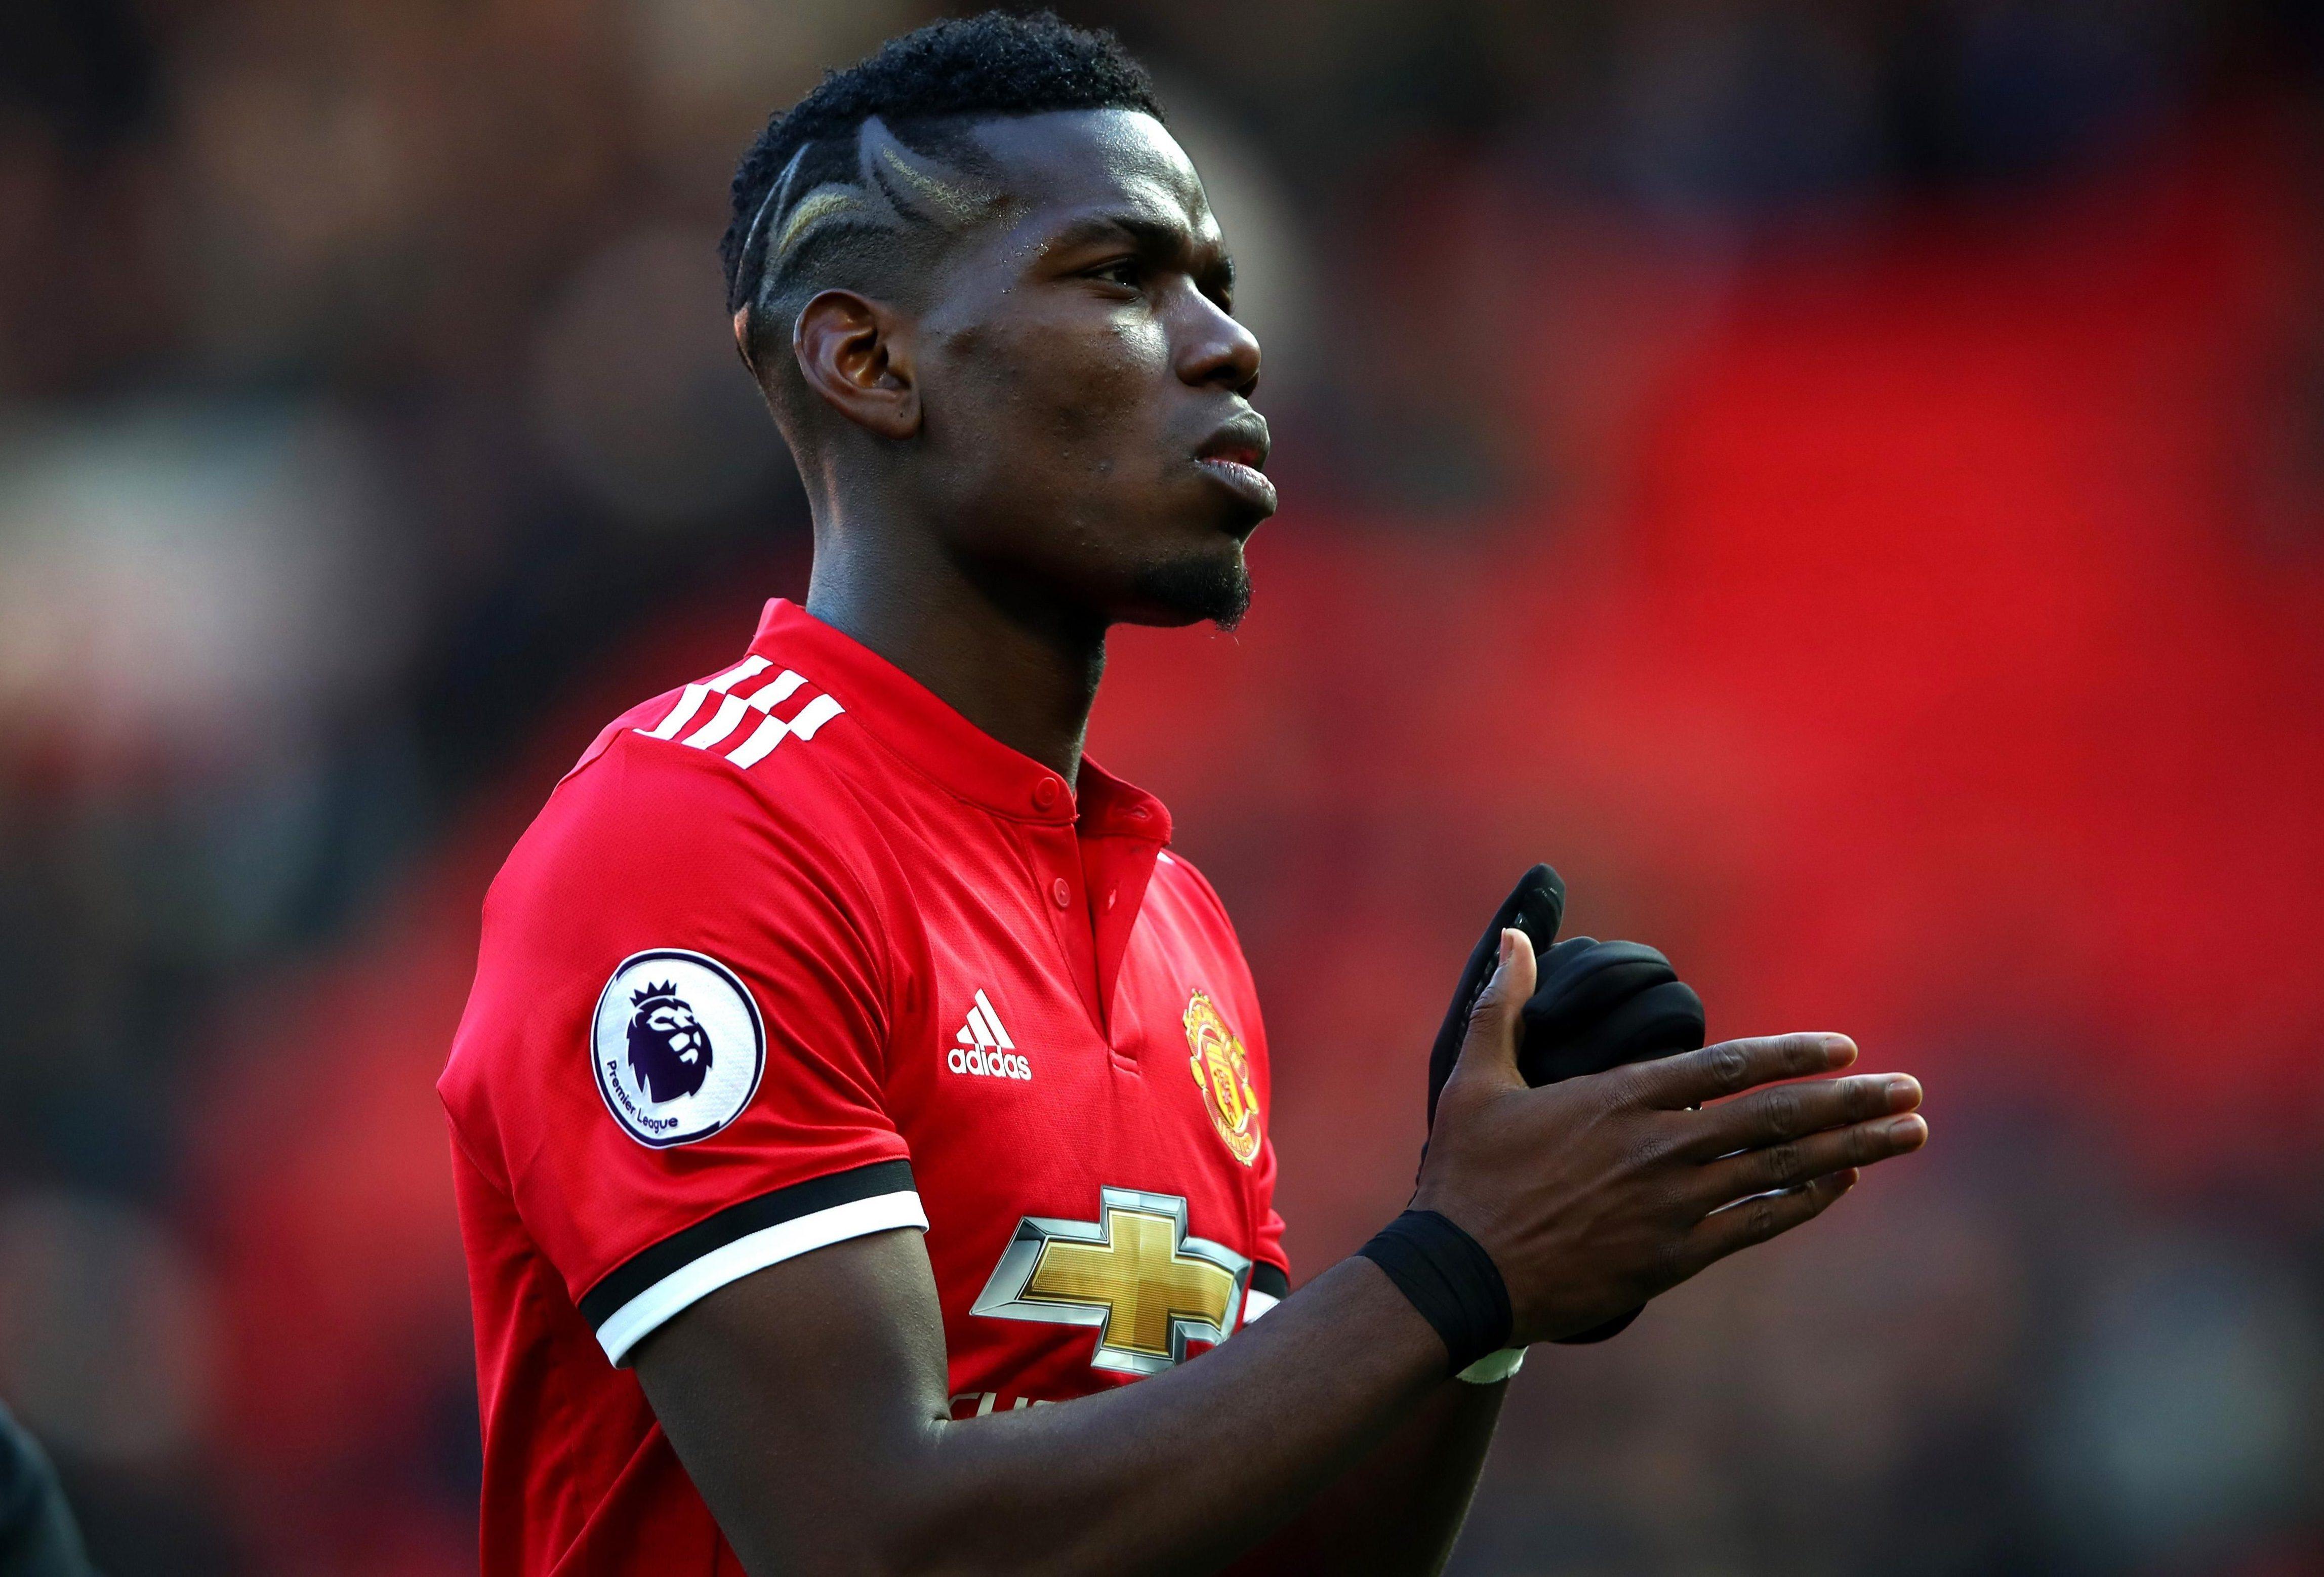 Pogba set United back £89m